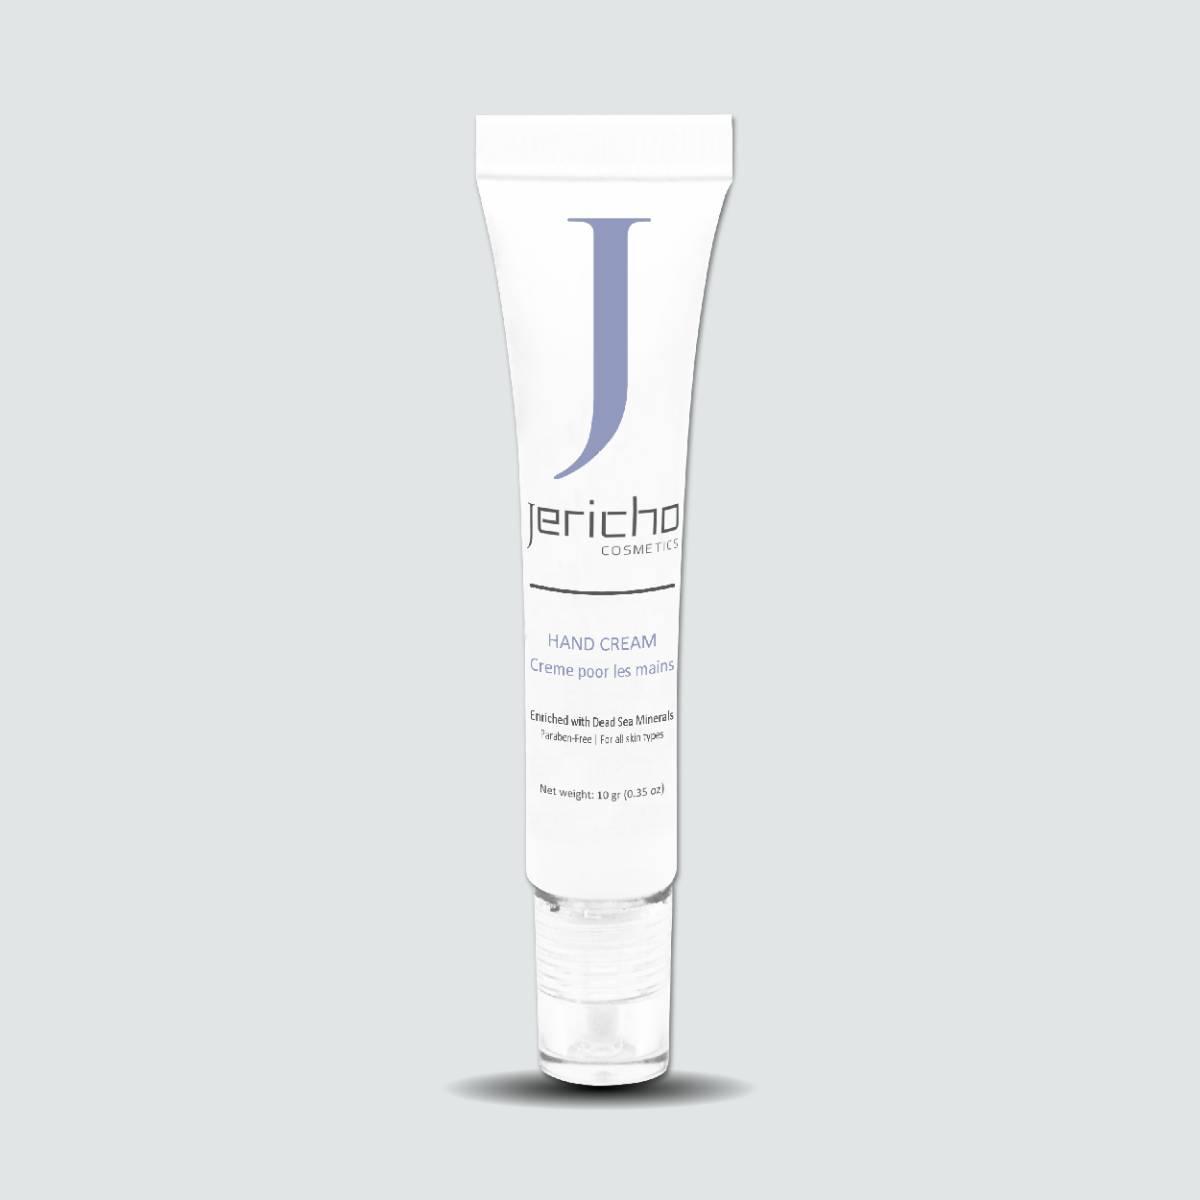 Jericho Hand Cream - 10gr